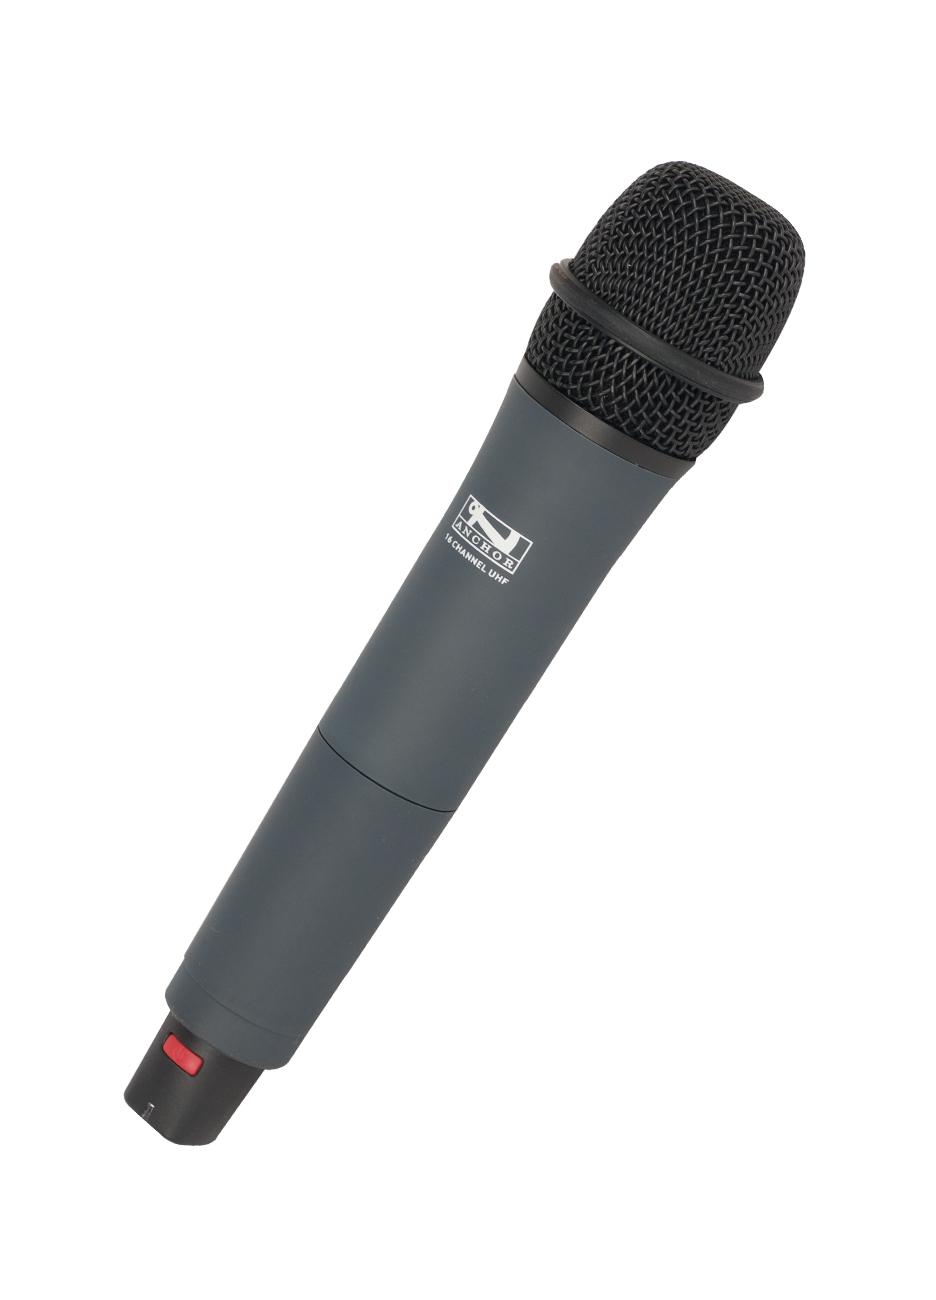 Wireless Handheld Microphone, 682-698 MHz Frequency Range